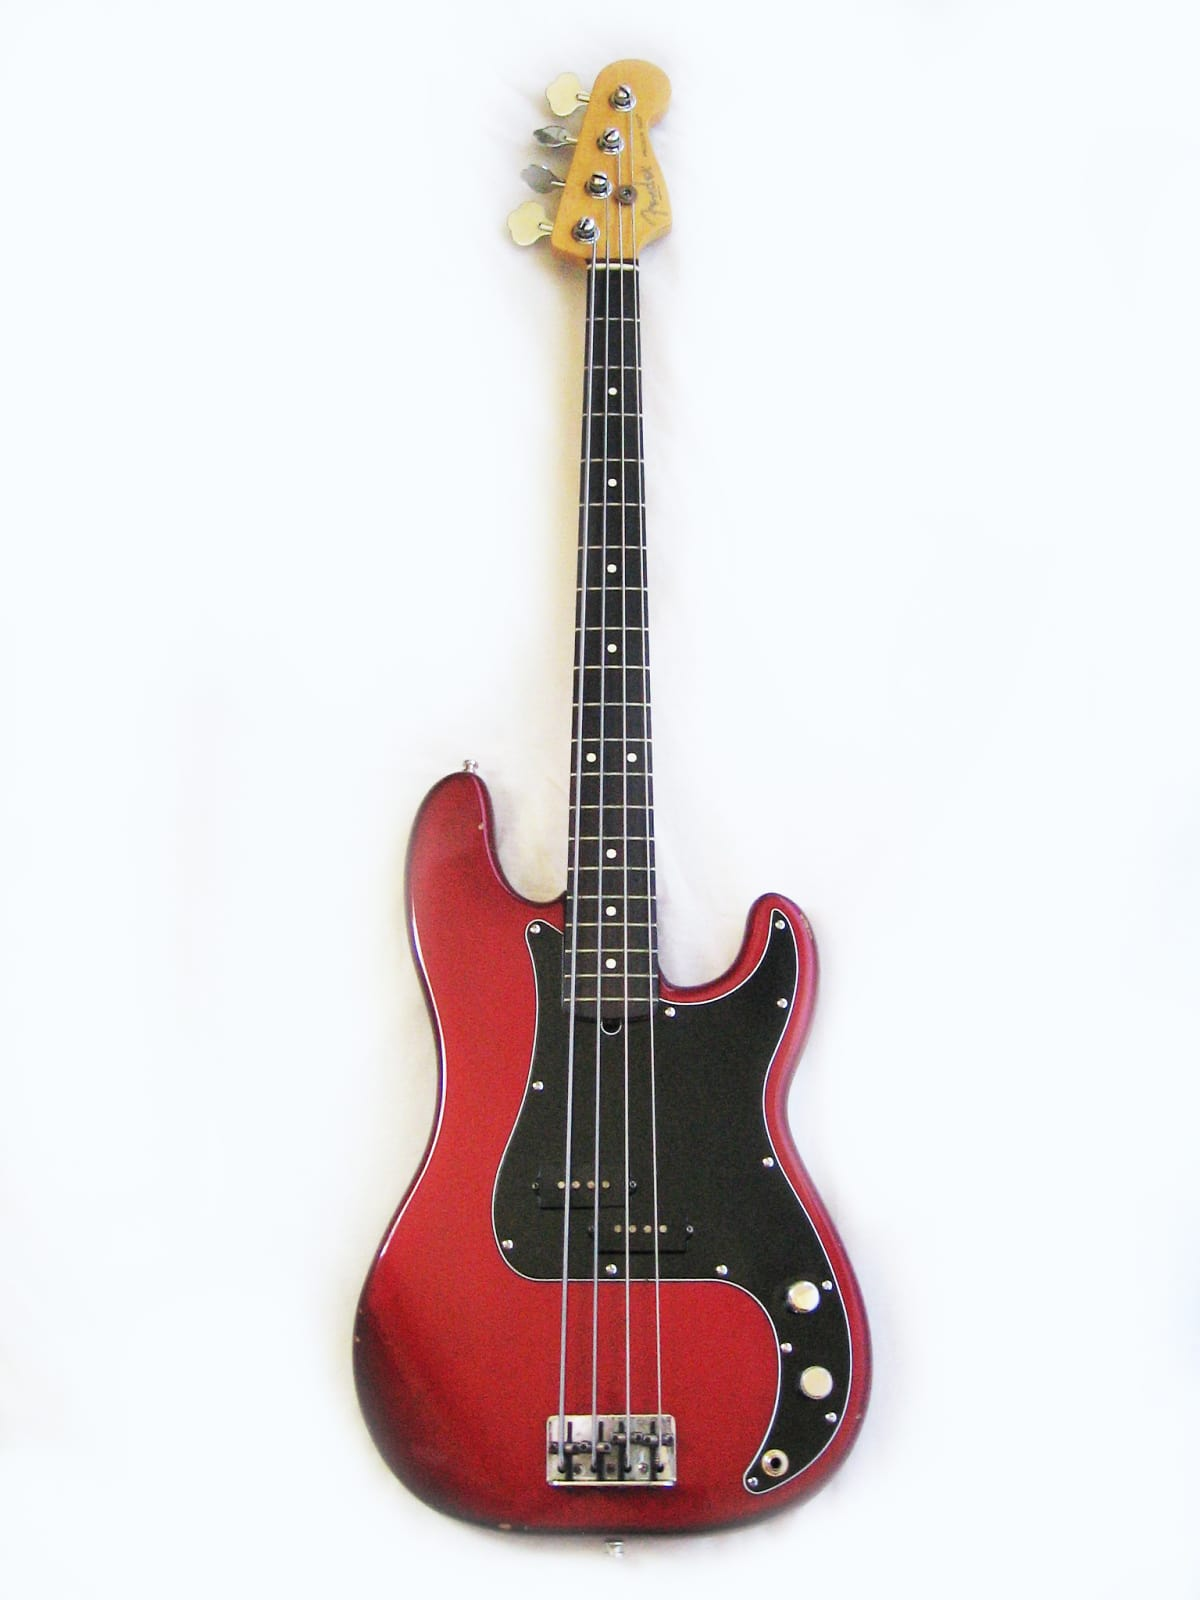 fender american standard precision bass 1995 made in usa reverb. Black Bedroom Furniture Sets. Home Design Ideas